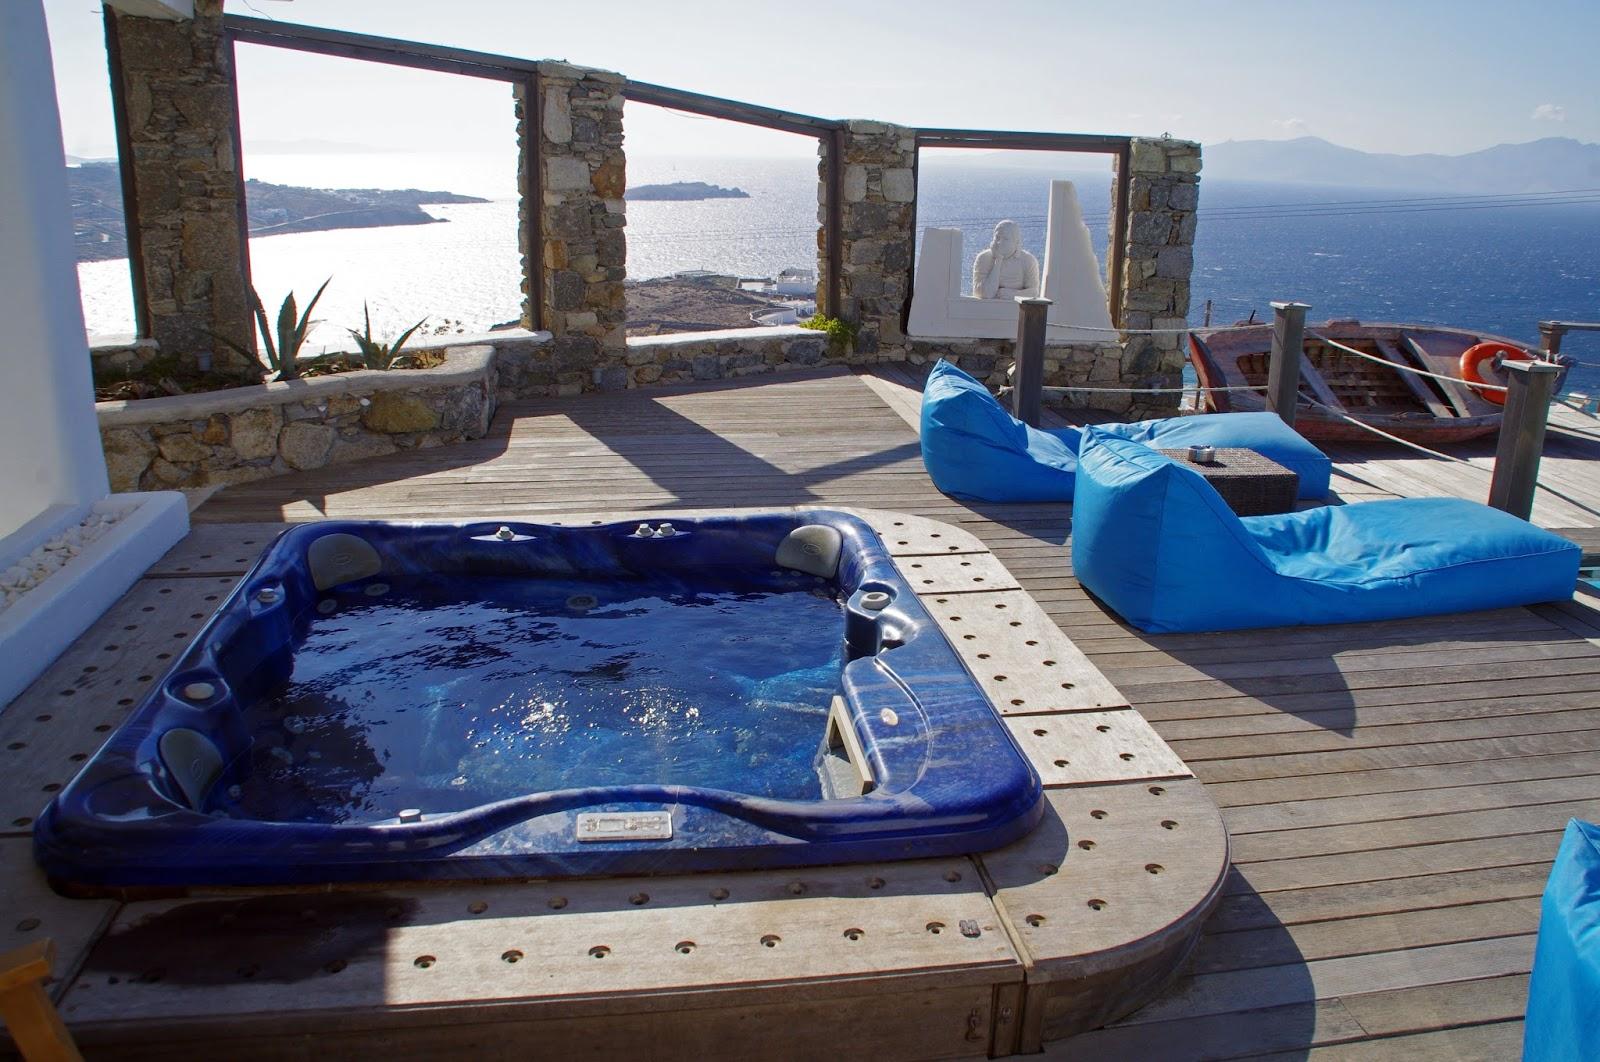 Tharroe of Mykonos Spa and Views